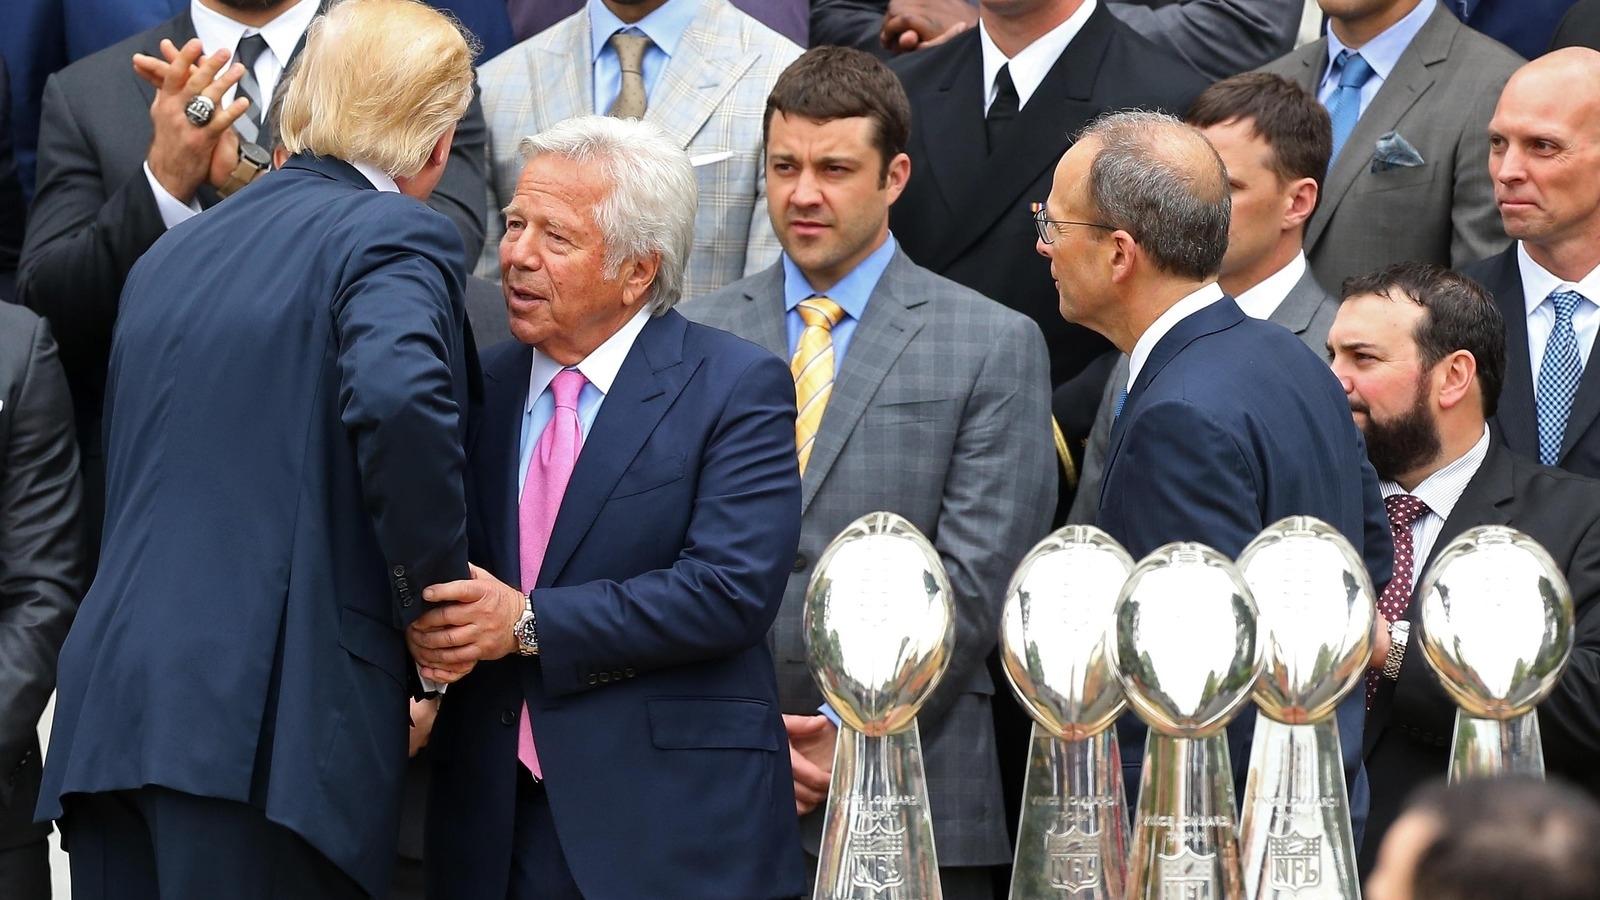 Robert Kraft Gifted Donald Trump A Super Bowl Li Ring For intended for Trump Super Bowl Kraft